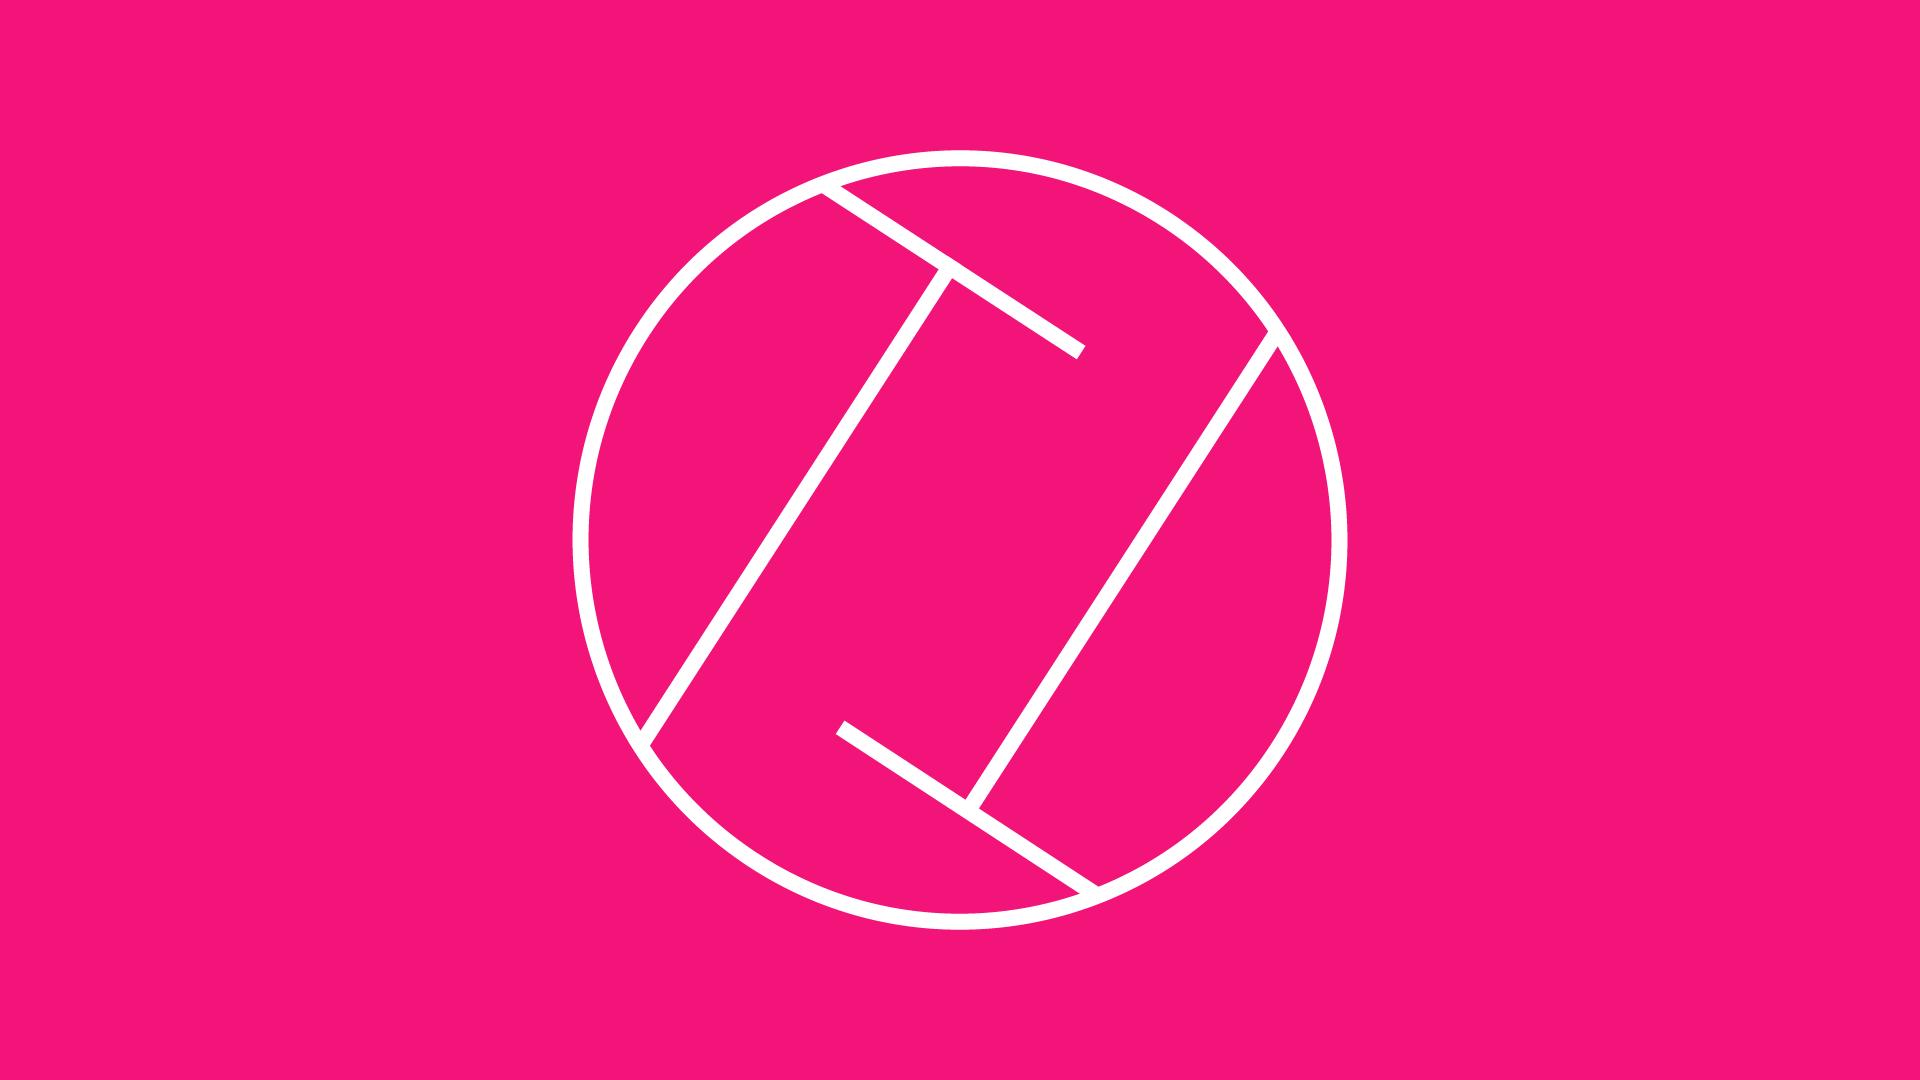 TT-Motion-pink-01.png